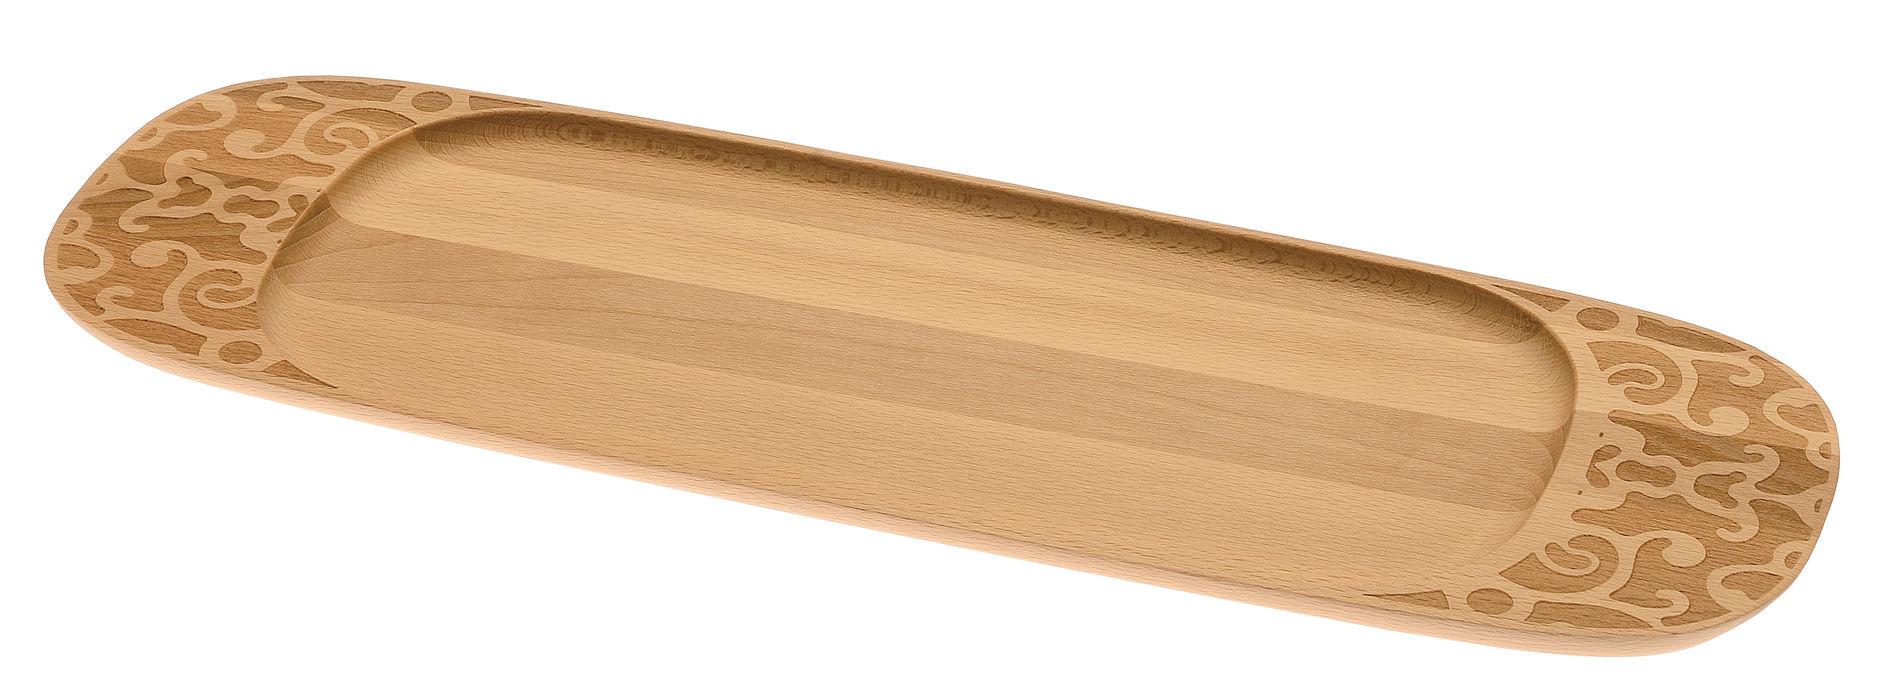 Tavola - Vassoi  - Piano/vassoio Dressed in Wood - / 45 x 14 cm di Alessi - Legno naturale - Faggio